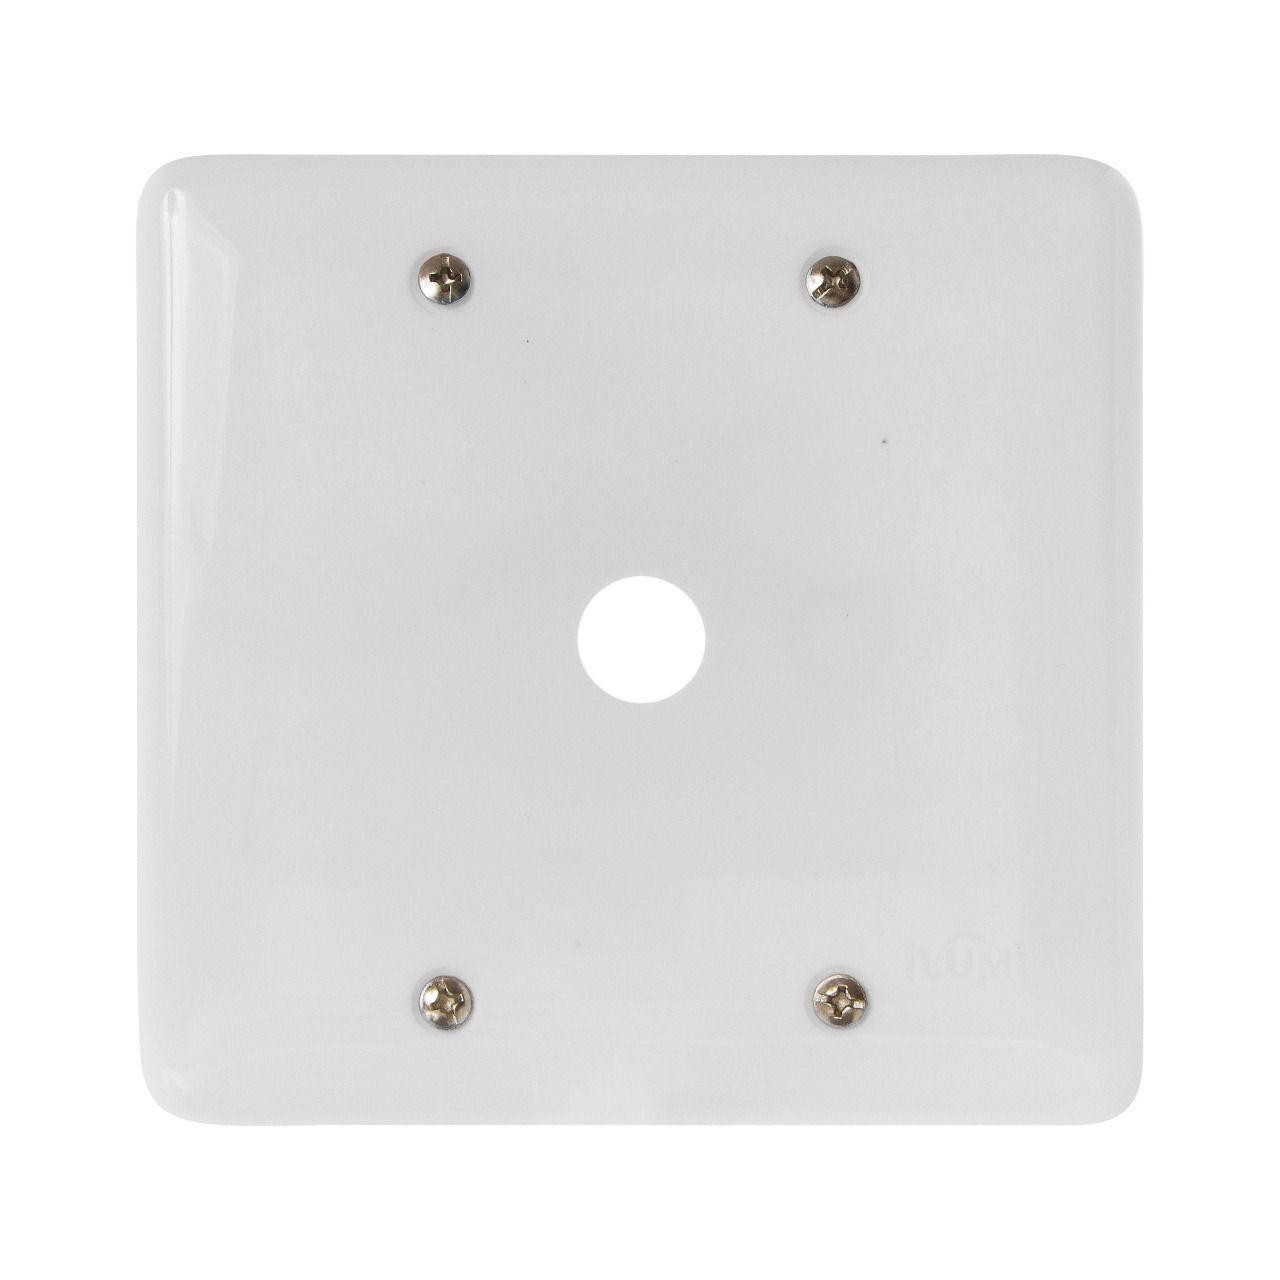 Placa Stylus 4X4 Com Furo 245B Ilumi